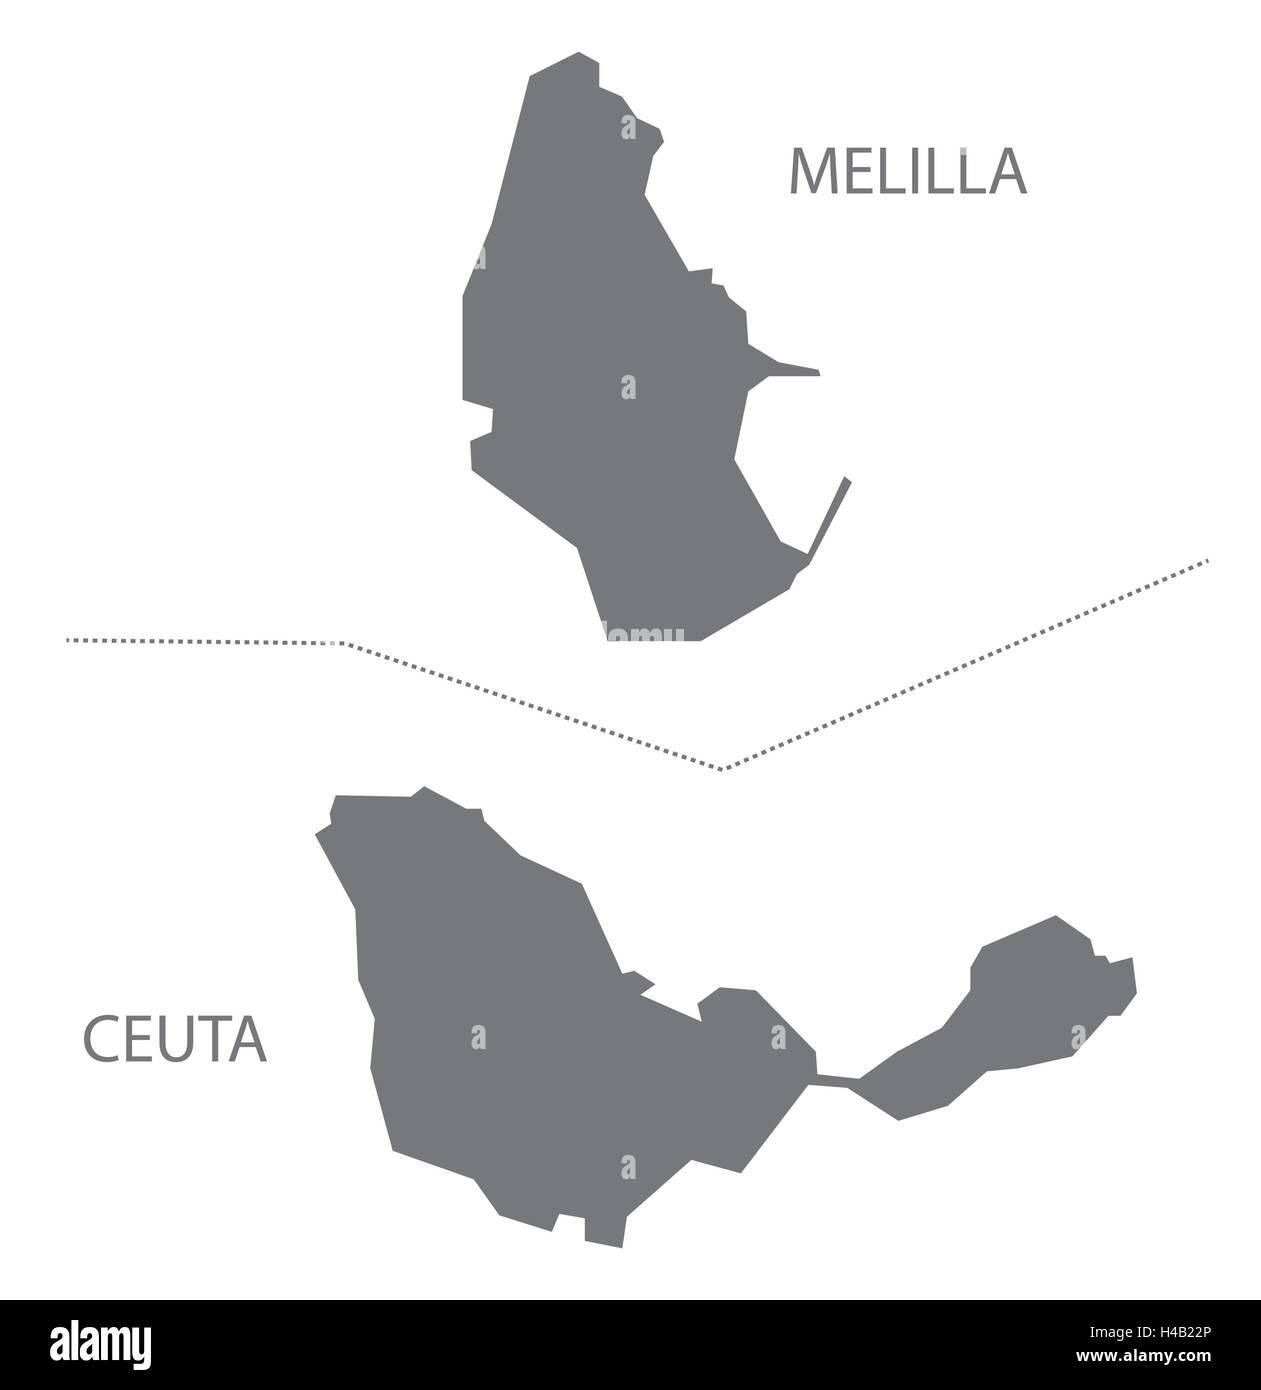 Melilla Spain Map.Melilla And Ceuta Spain Map In Grey Stock Vector Art Illustration